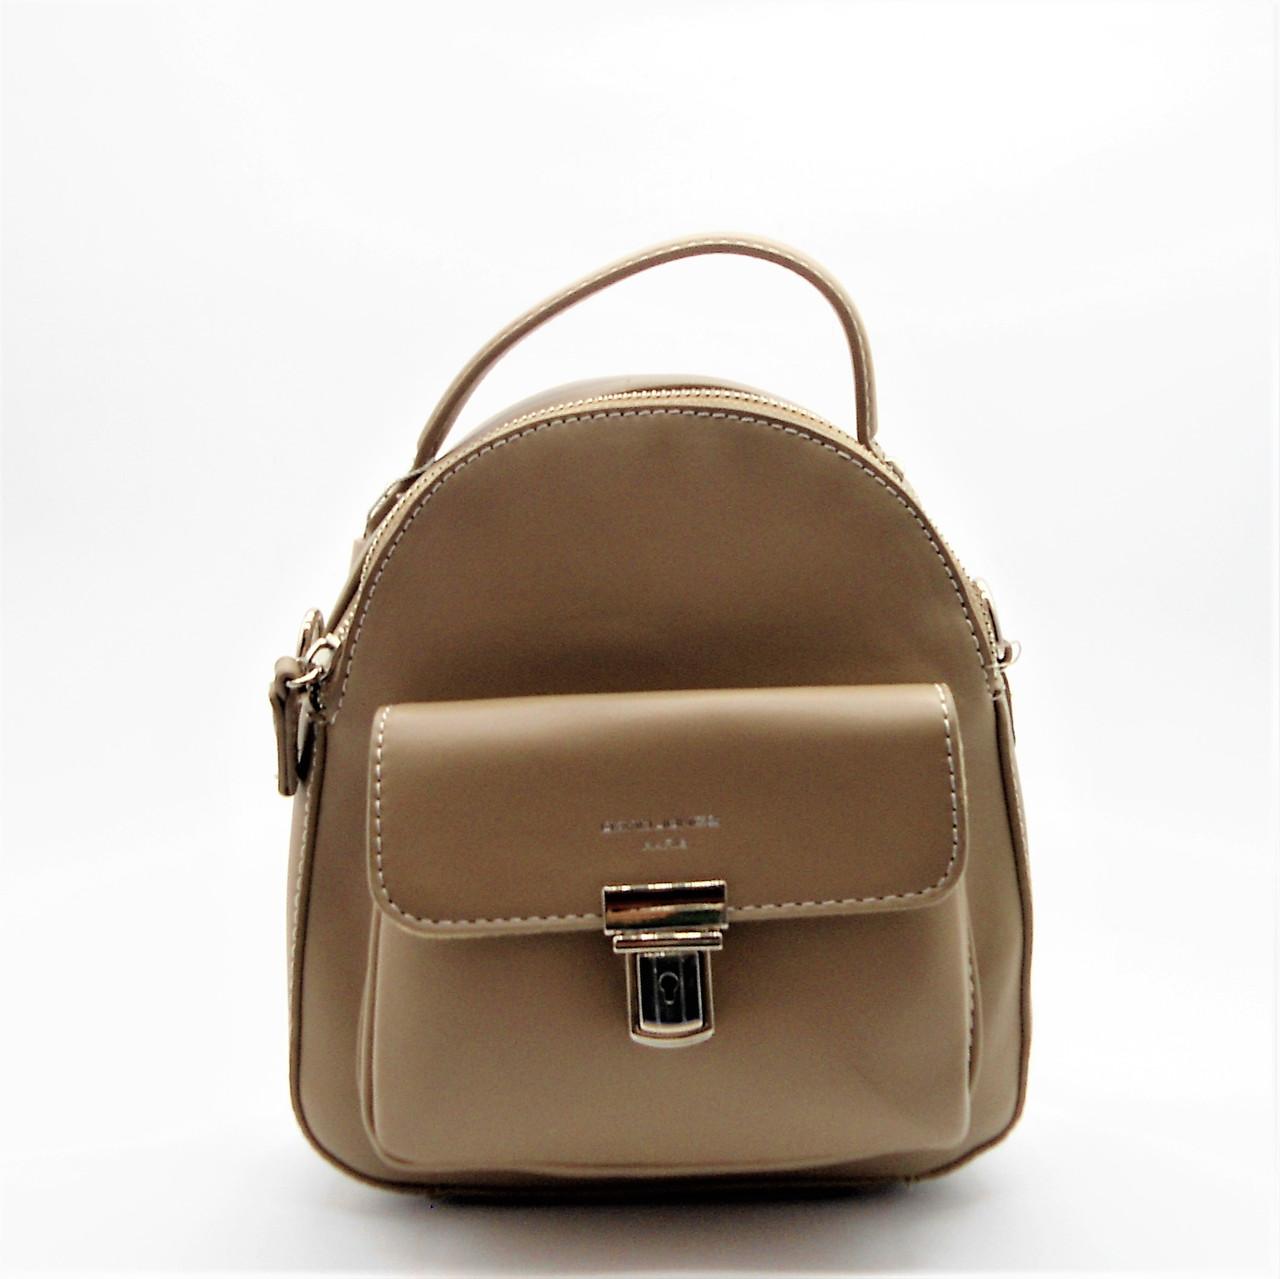 090e8b23f9fc Женский рюкзак David Jones из экокожи бежевого цвета YEU-531309 ...